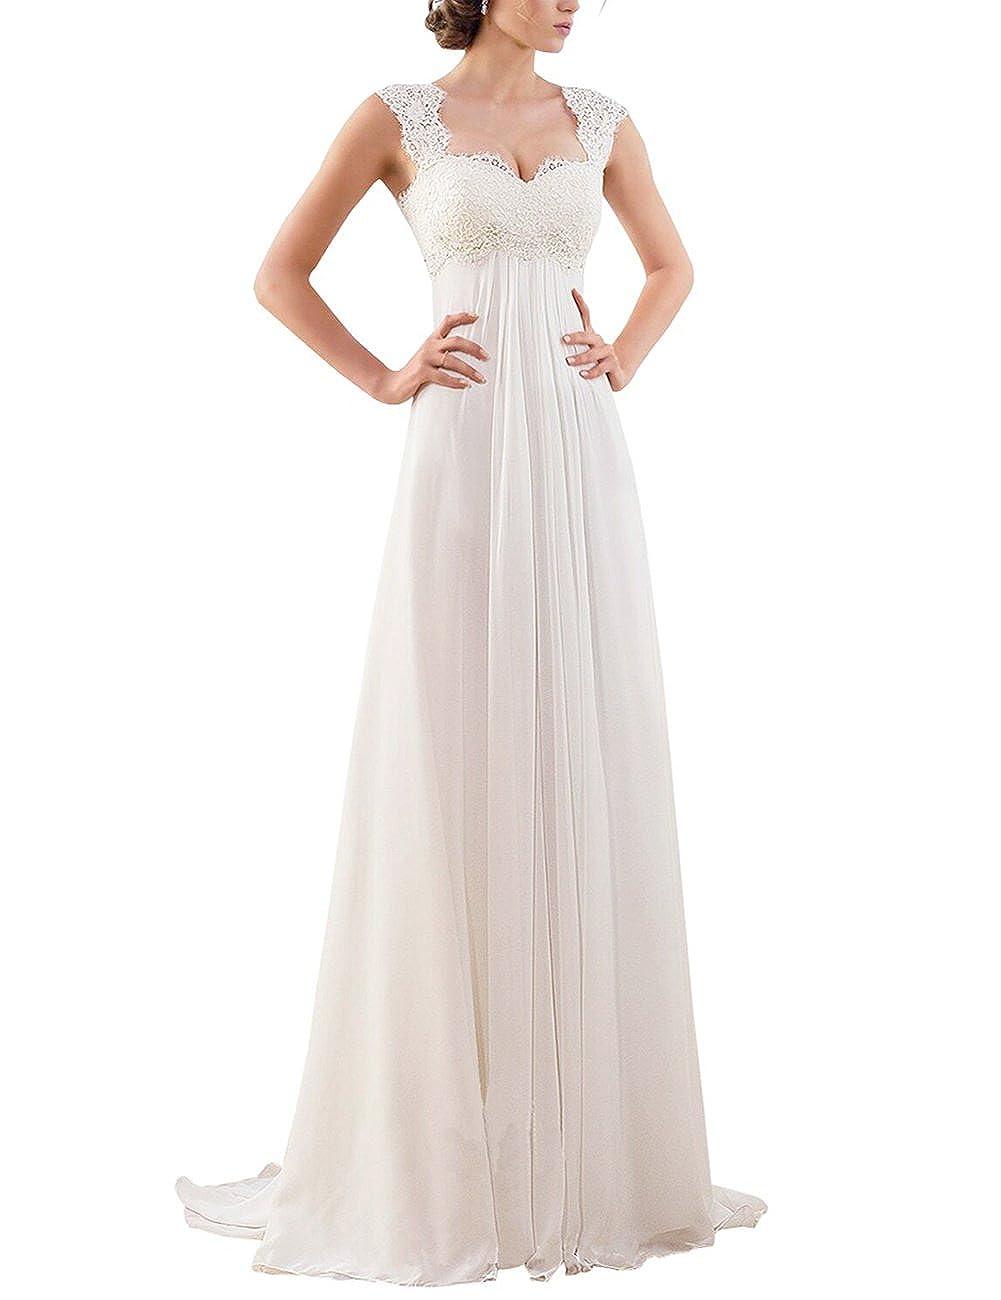 Erosebridal /Ärmellos Spitze Chiffon Hochzeitskleid Brautkleid